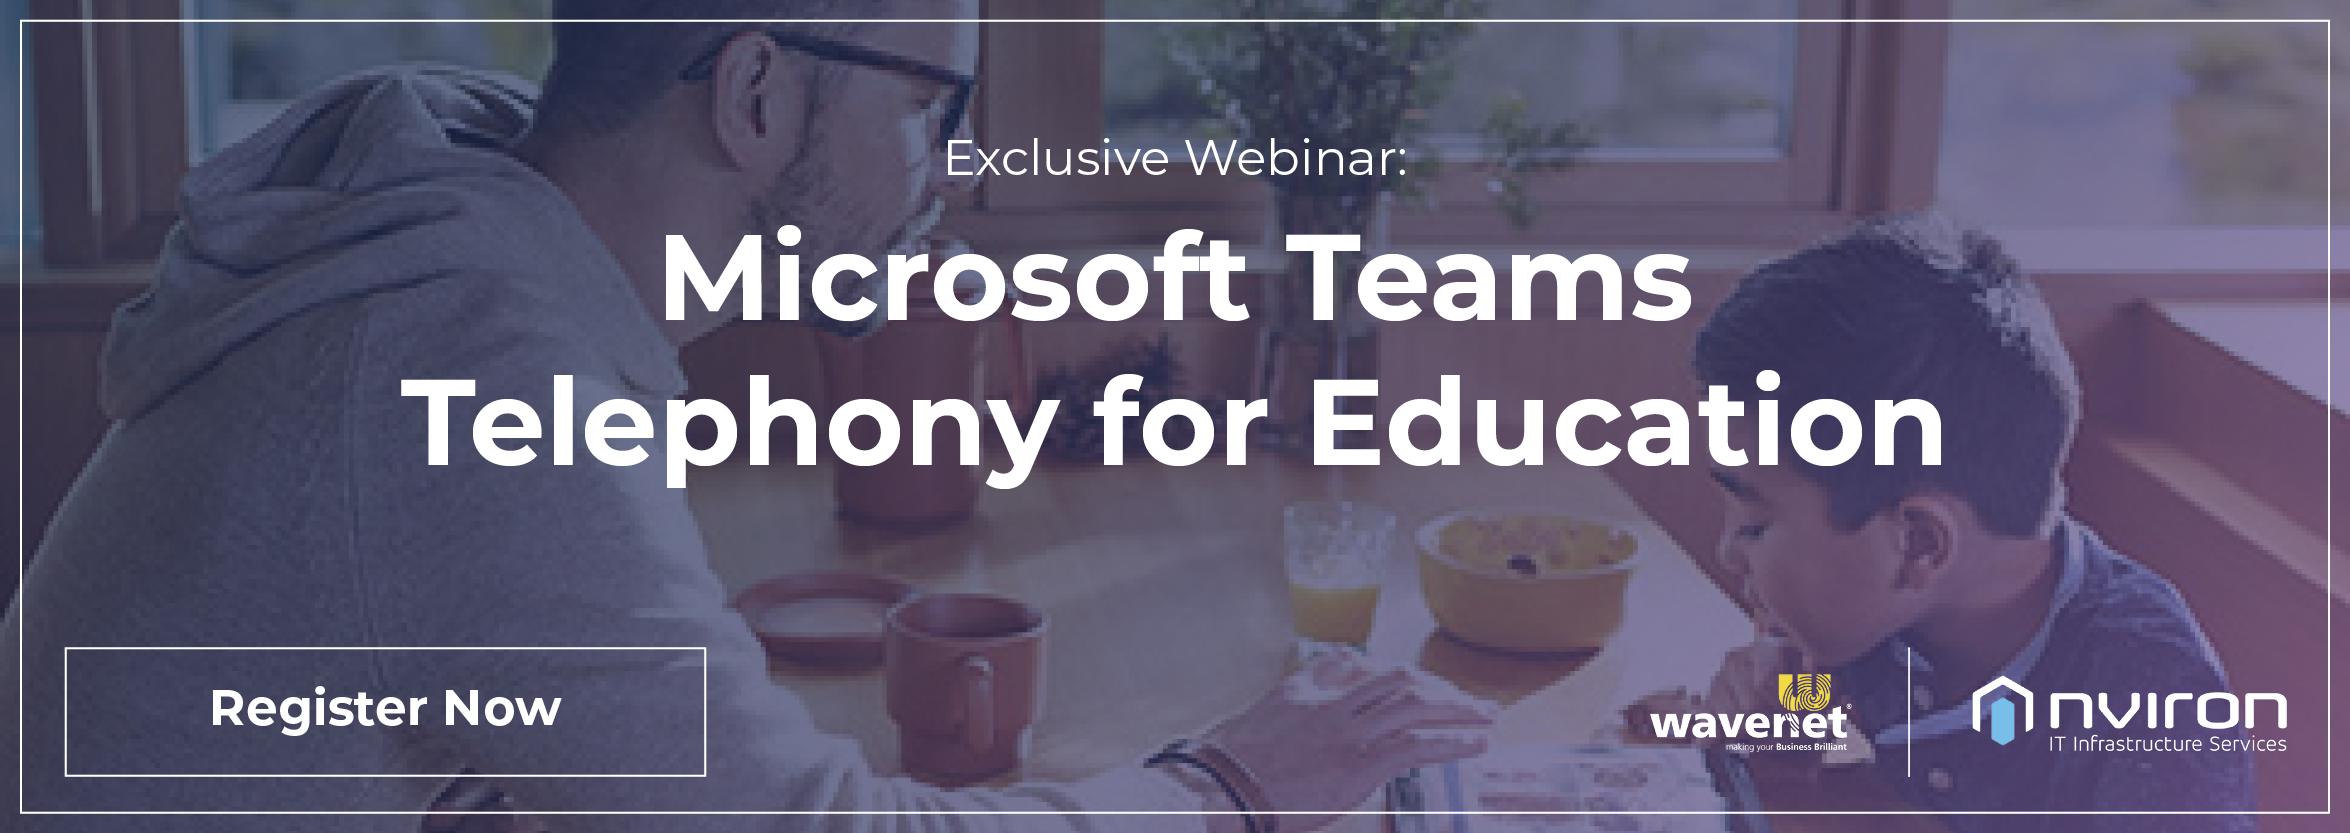 nviron Microsoft Teams Telephony for Education